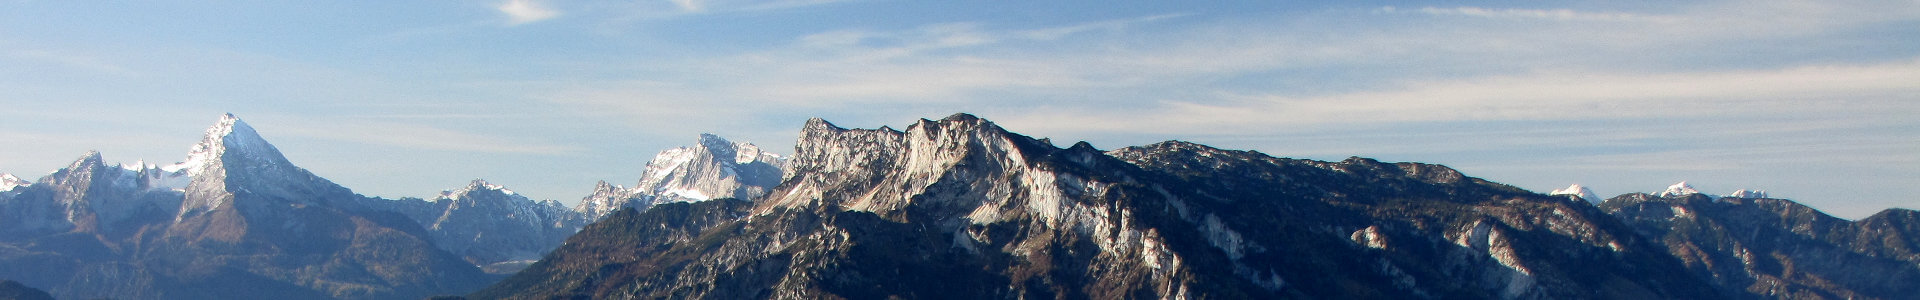 Austria Insiderinfo - Untersberg